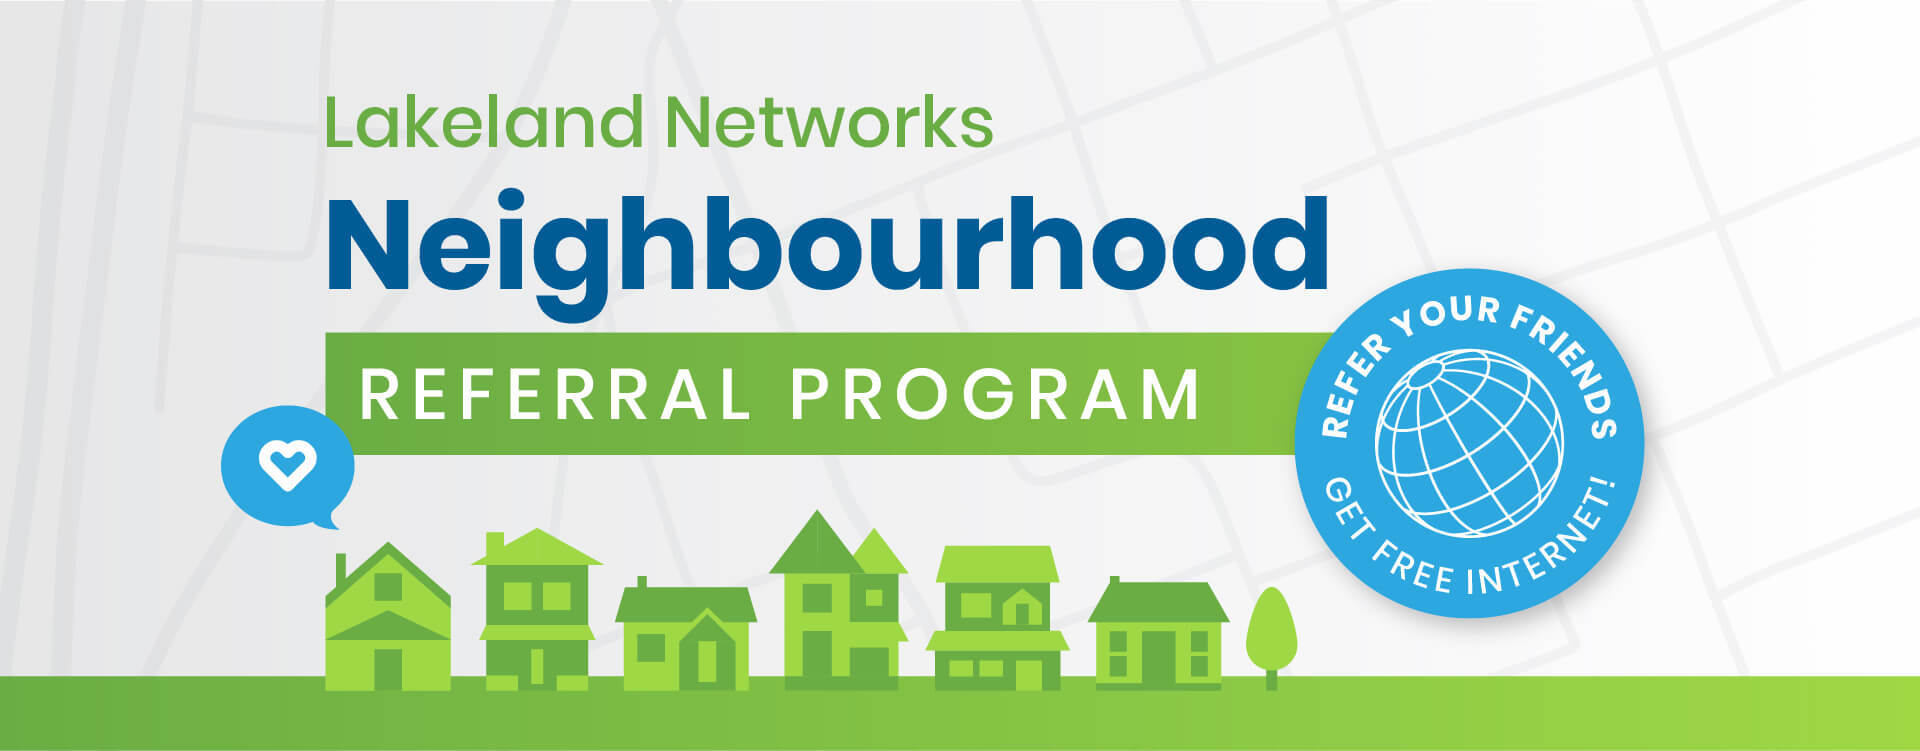 Lakeland Networks Neighbourhood Referral Program